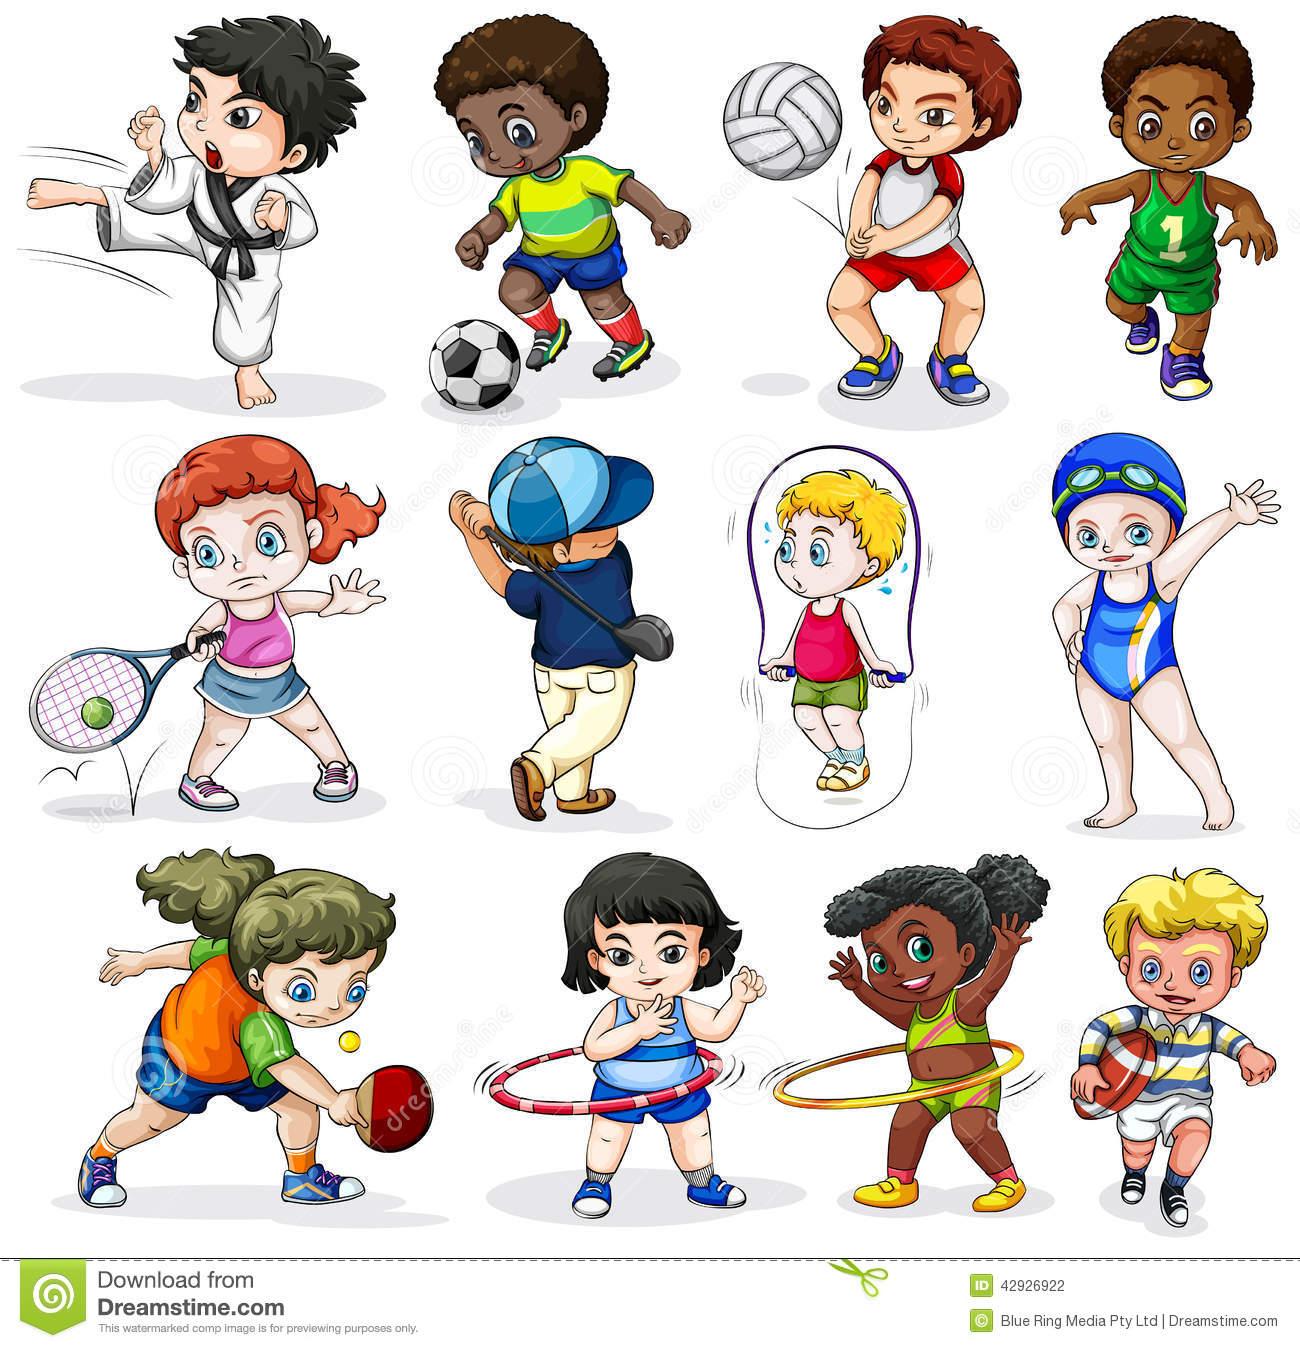 sports activities clipart sport activity different engaging lllustration background diff clipground outdoor activit rentes blanc fond dans sur un cliparts